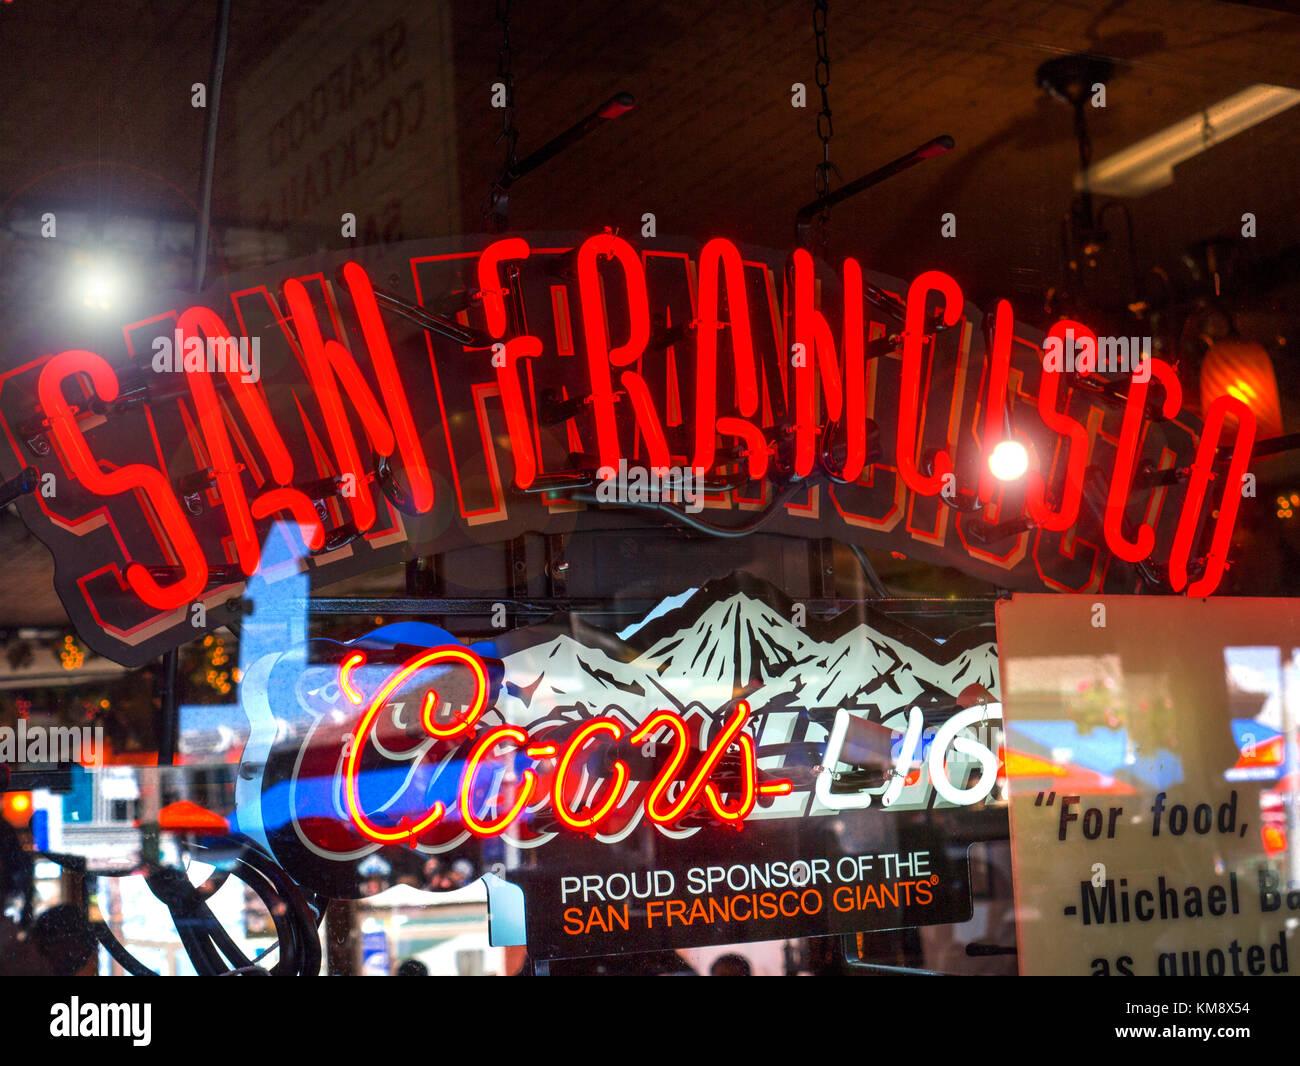 'San Francisco' bar red neon sign in window of Pier 39 San Francisco drinks bar California USA - Stock Image